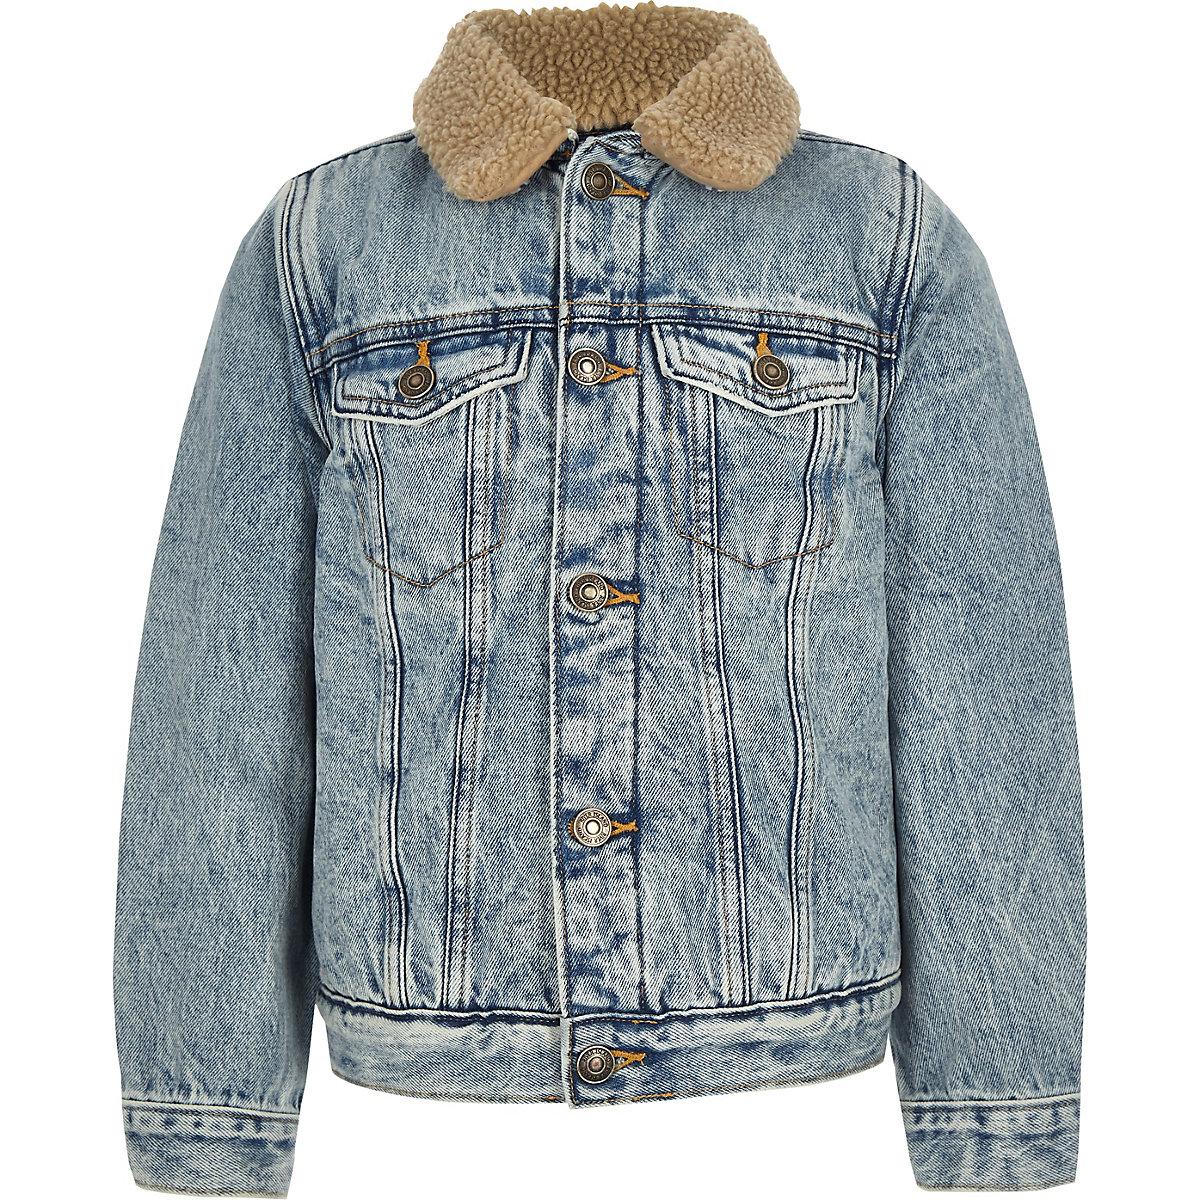 Boys blue borg denim jacket